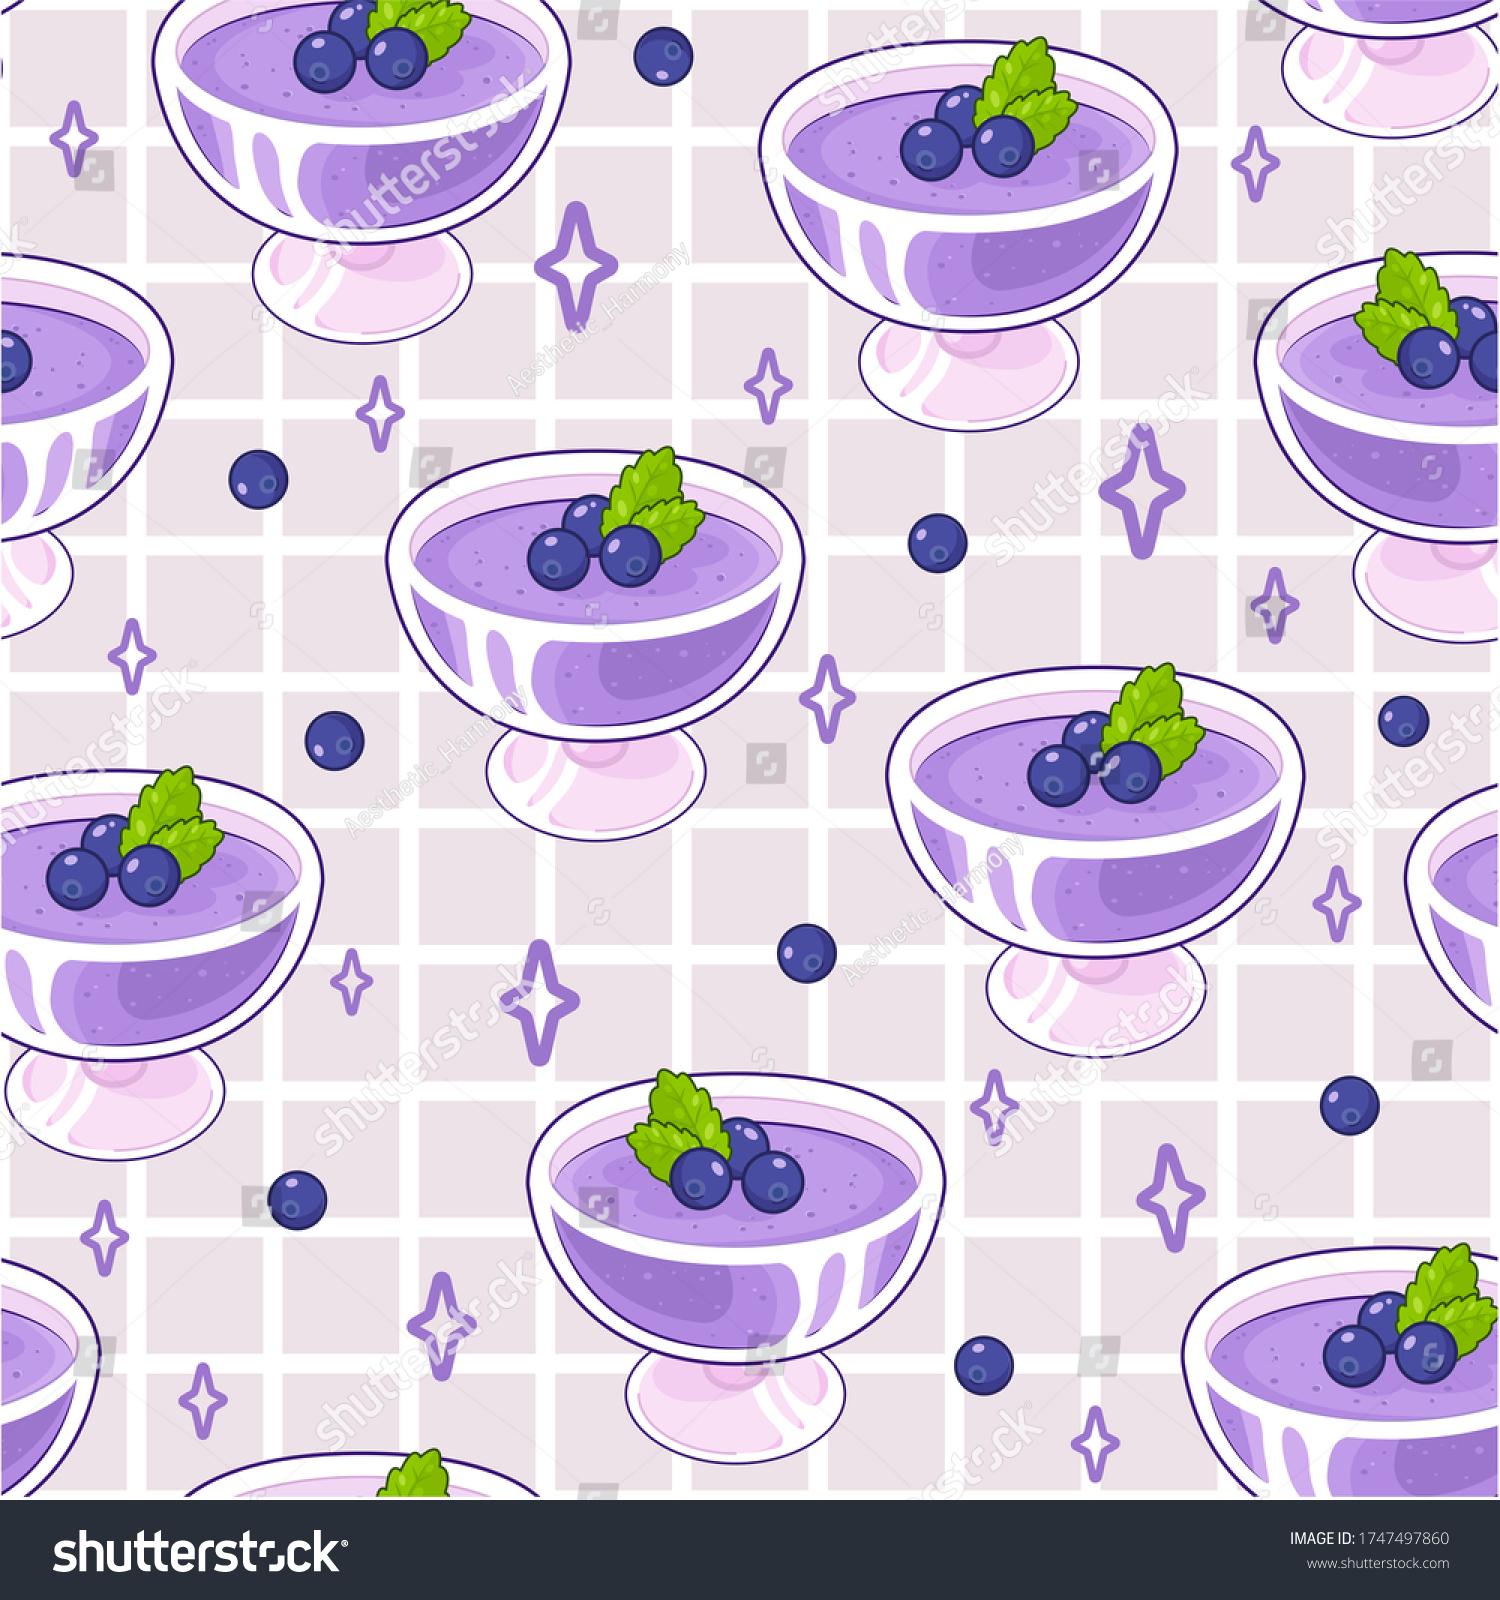 Seamless Berry Dessert Pattern Background Wallpaper Stock Illustration 1747497860